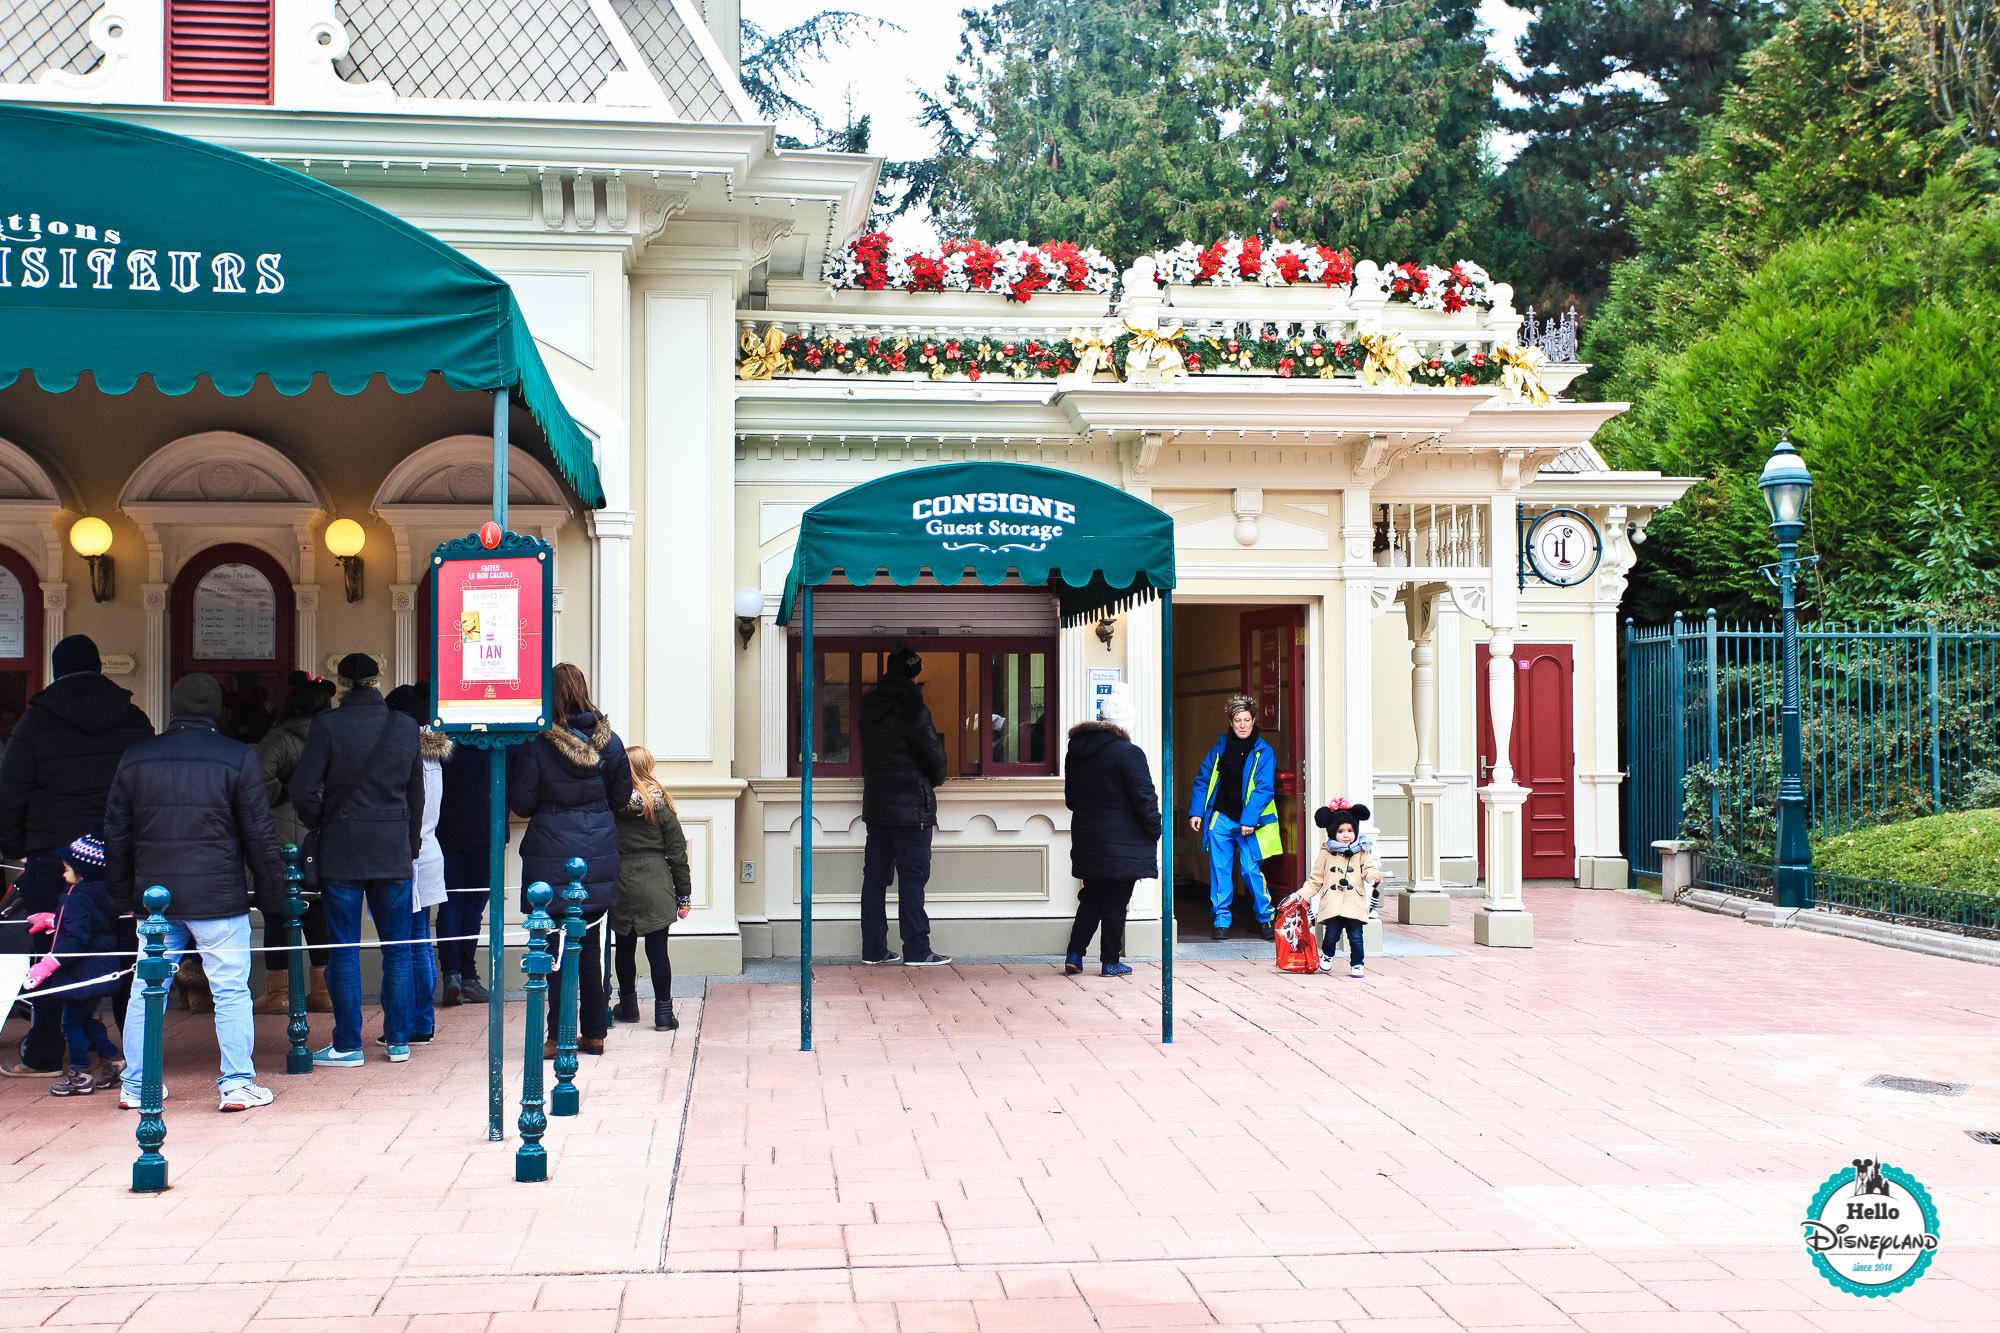 Hotel Disneyland Paris Telephone